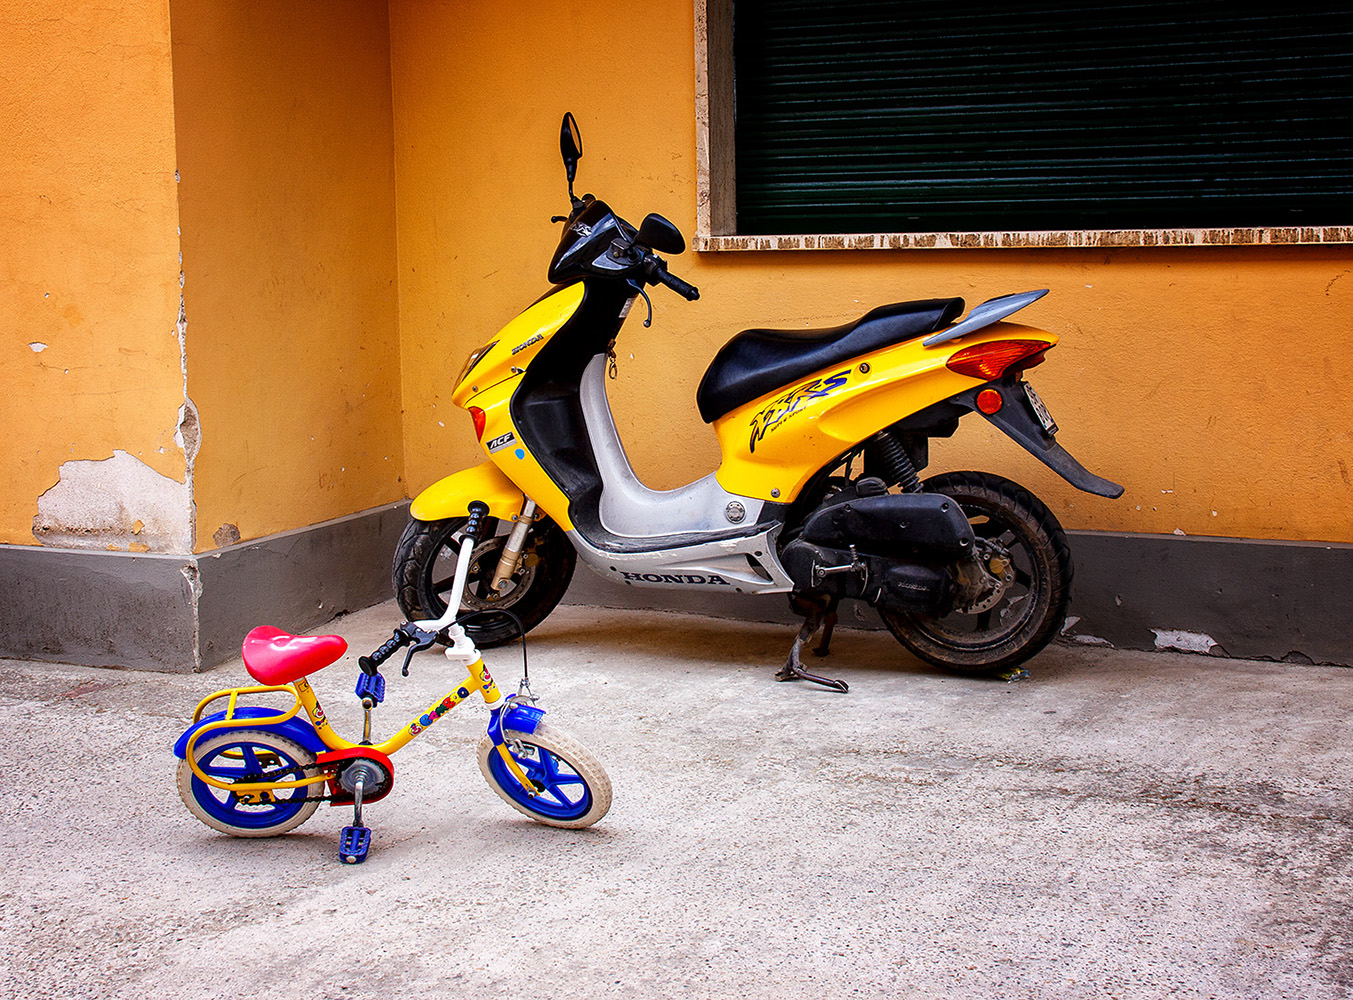 Transportation_Start Small & Dream Big_Joy Melchiori_AB_DPI_Honour & Most Apt Title